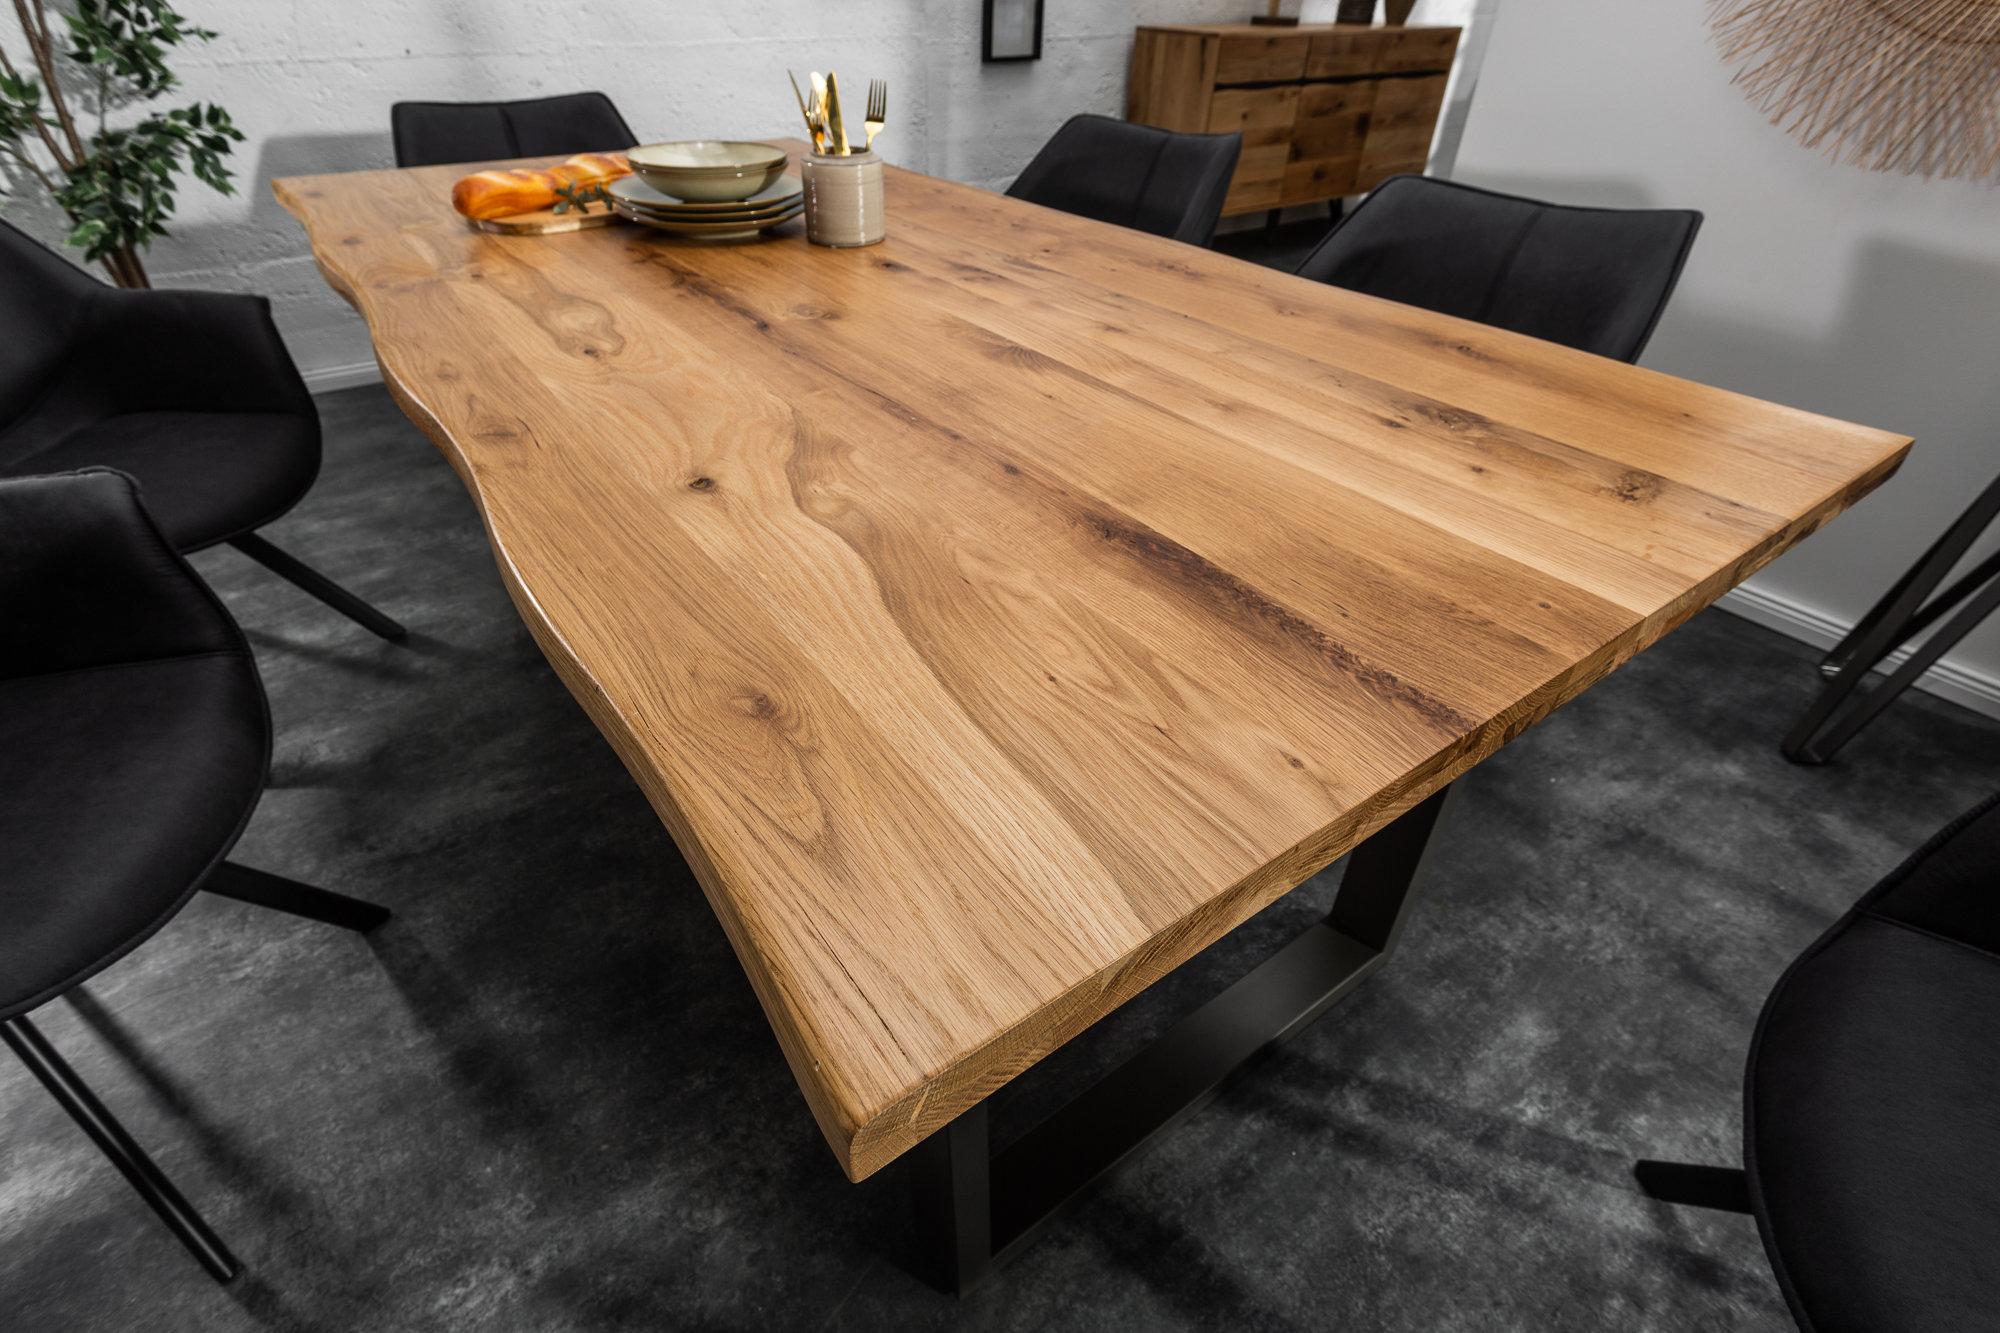 LIVING EDGE Solid Tree Edge Dining Table 9cm Wild Oak 9.9cm Top   SITHEIM  EuropeLIVING EDGE Solid Tree Edge Dining Table 9cm Wild Oak 9.9cm ...